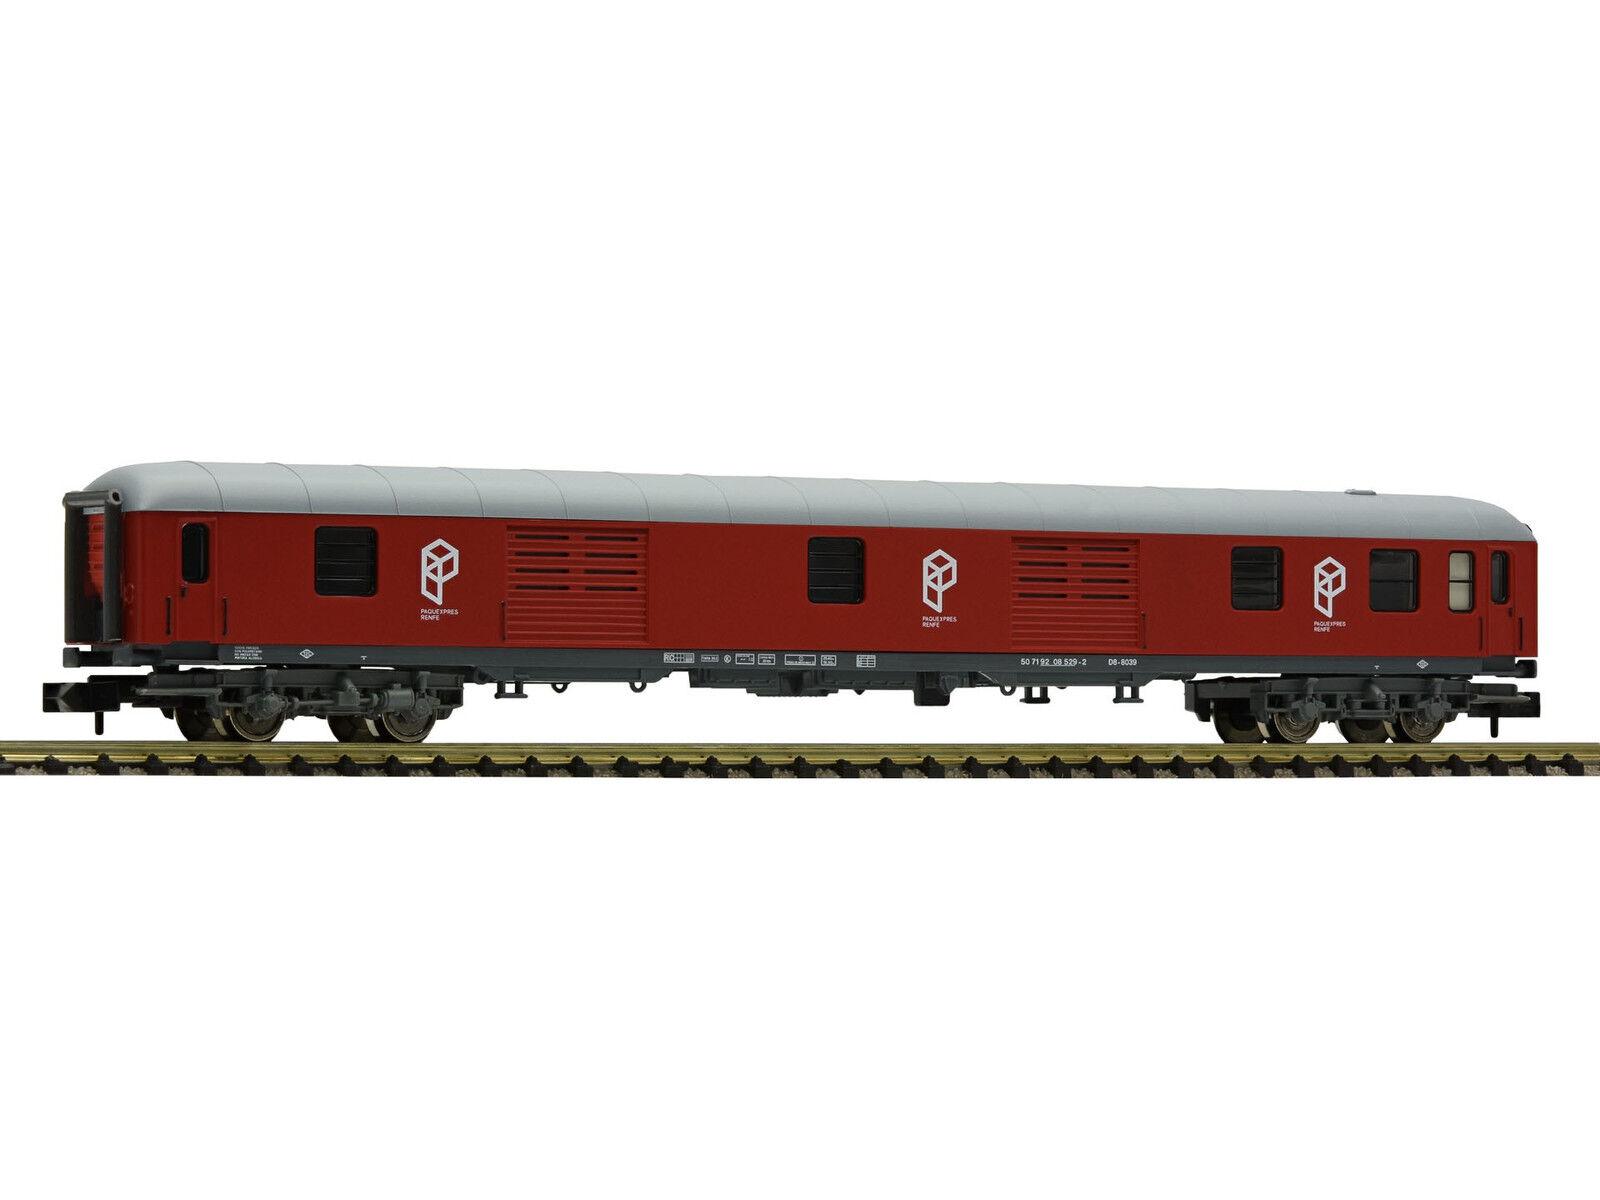 Fleischmann 818902-post carrello paqueexpress RENFE-Traccia N-NUOVO